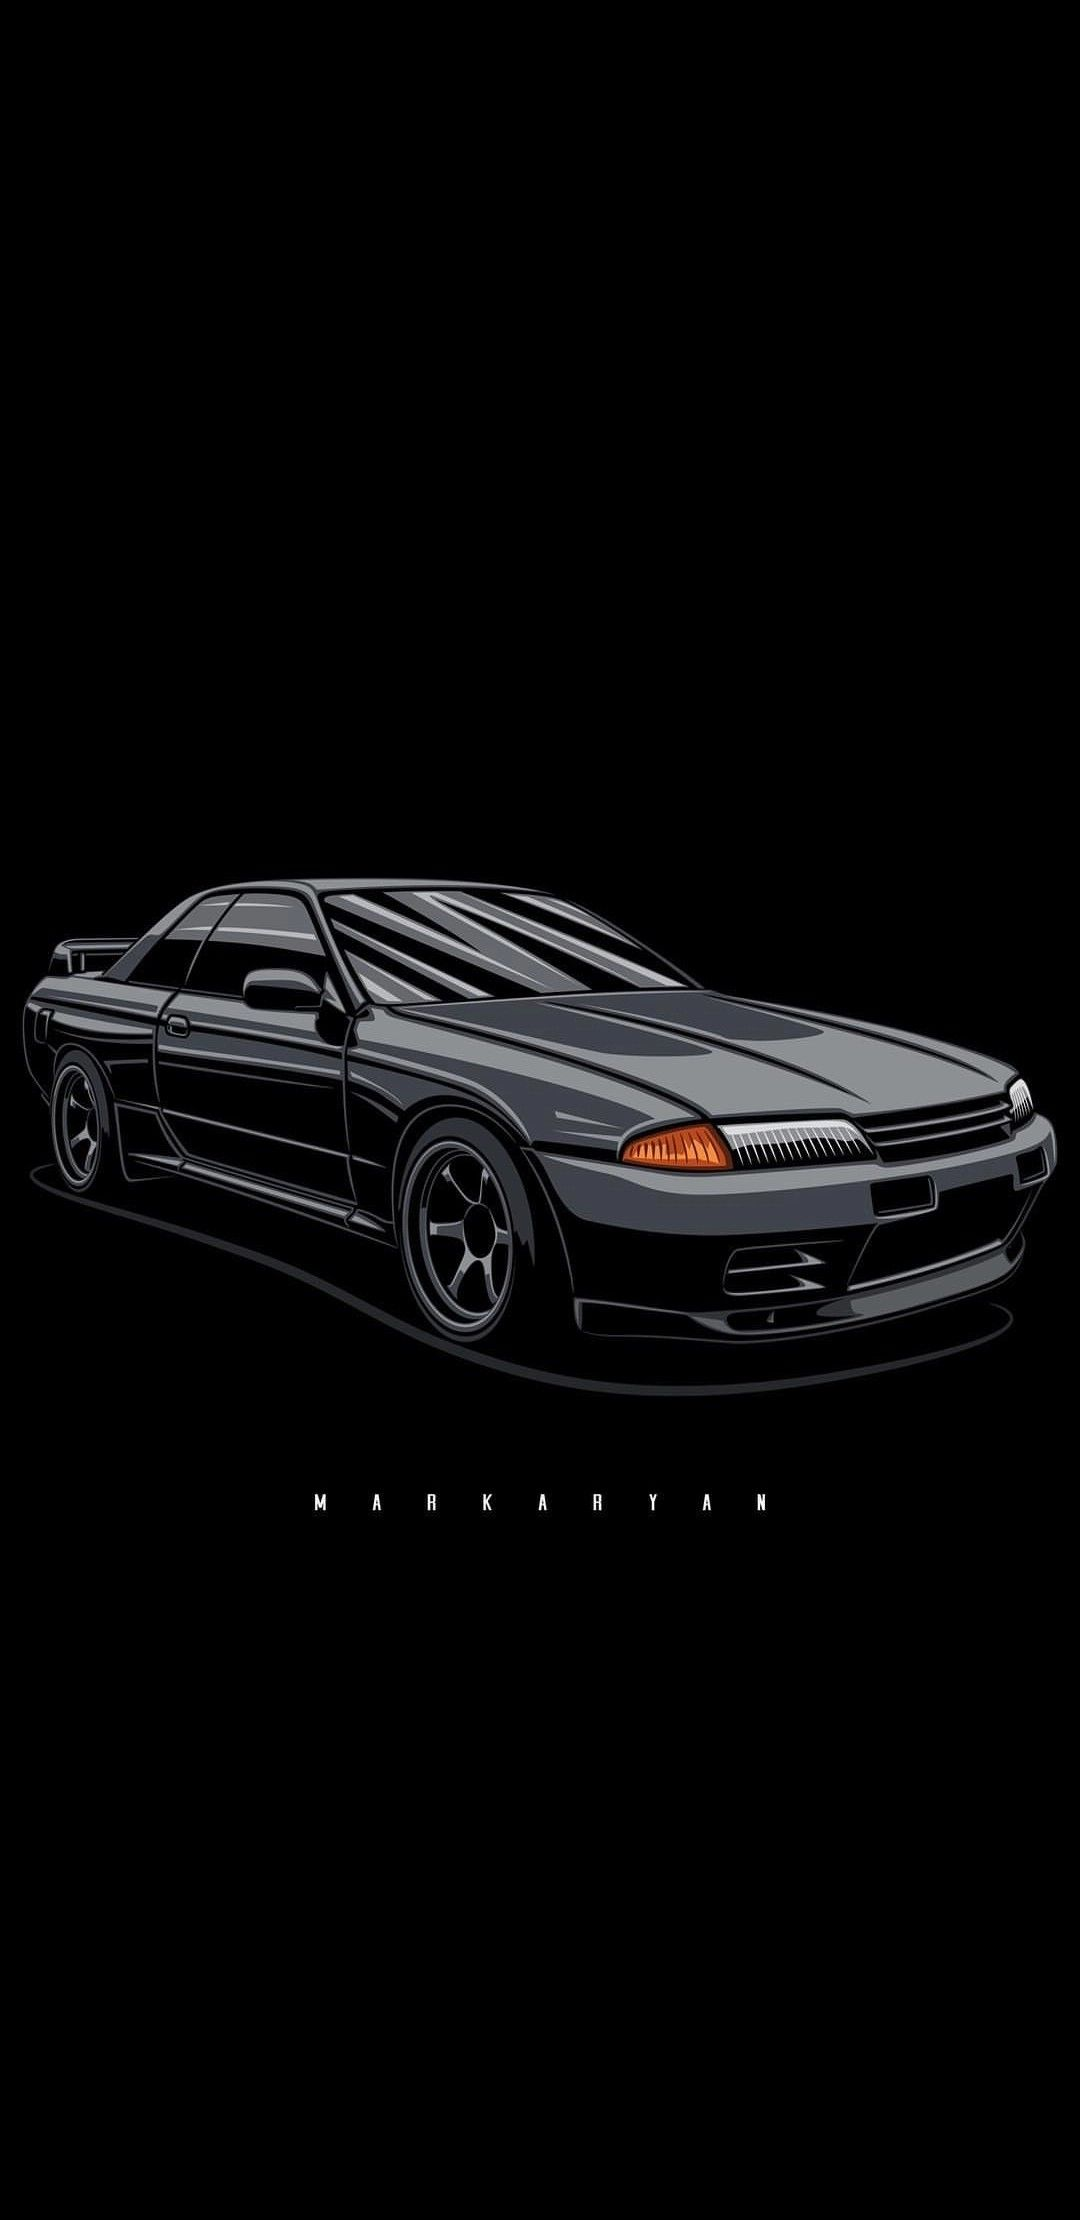 Car Wallpaper おしゃれまとめの人気アイデア Pinterest Hoku